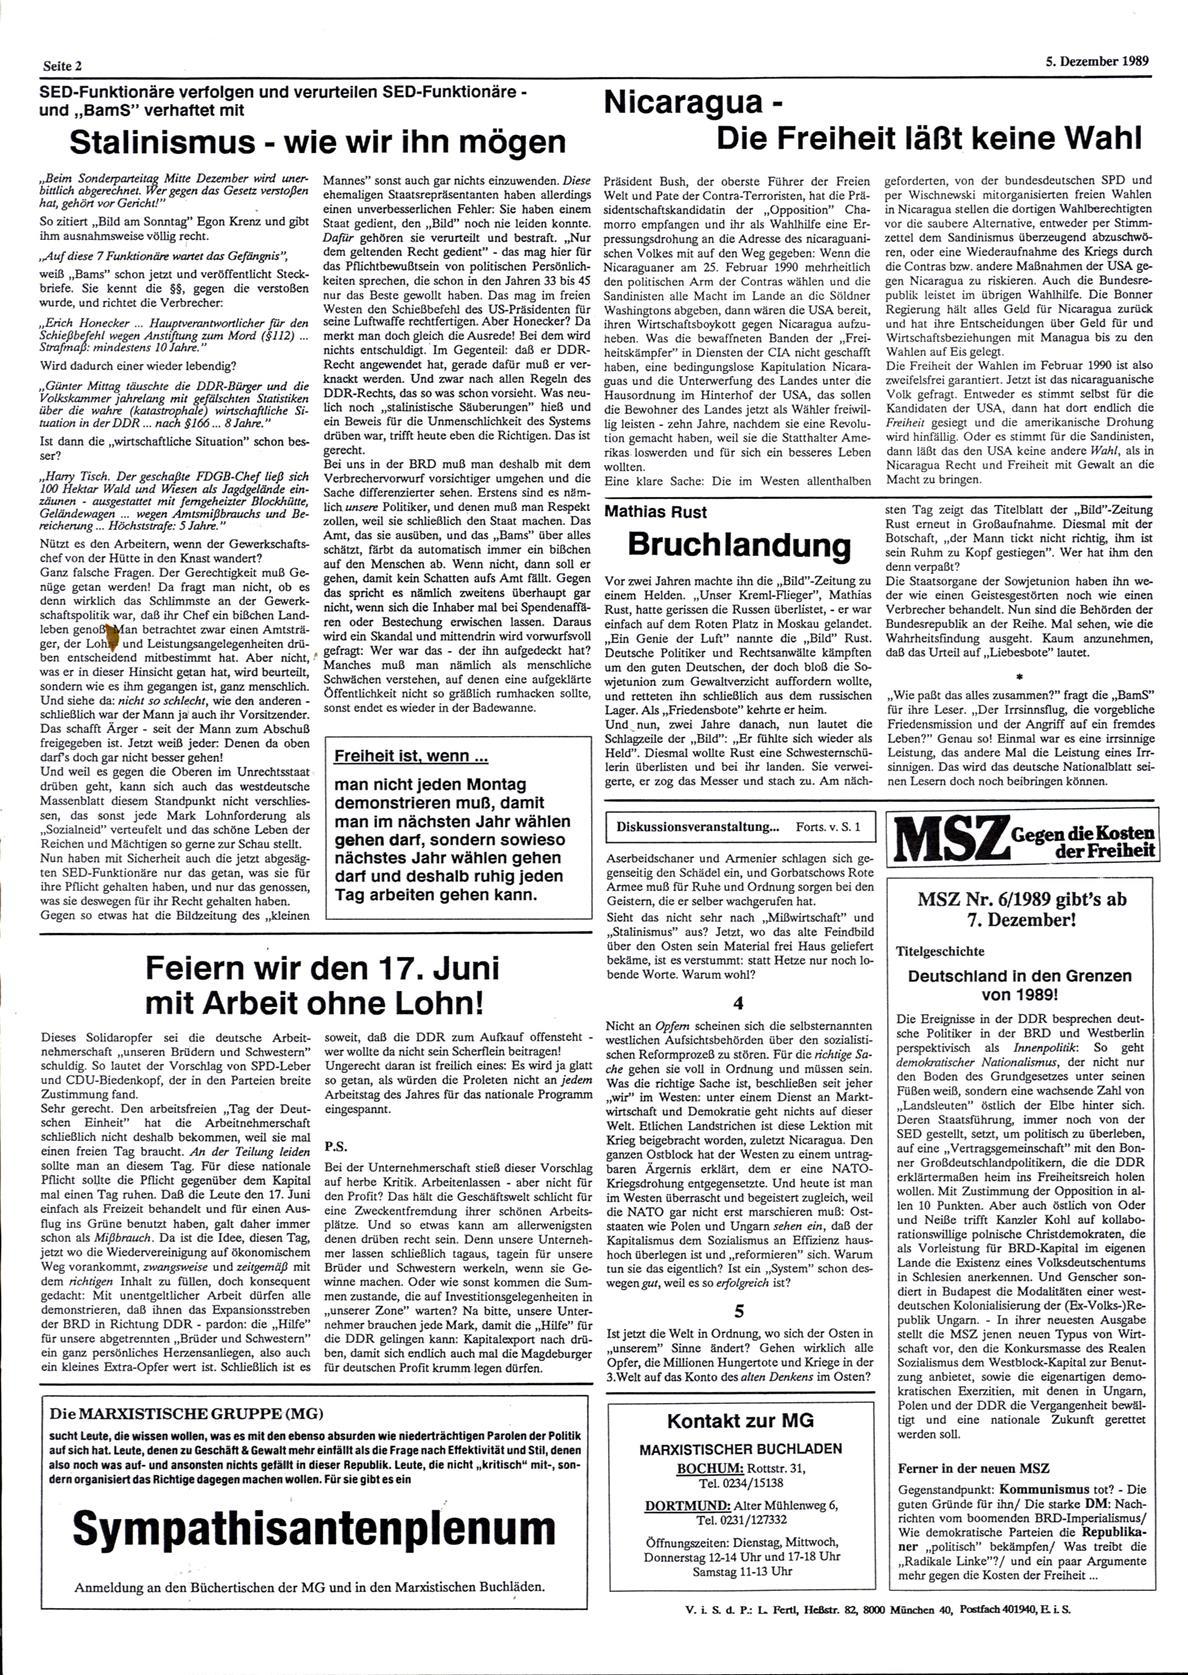 Bochum_BHZ_19891205_199_002